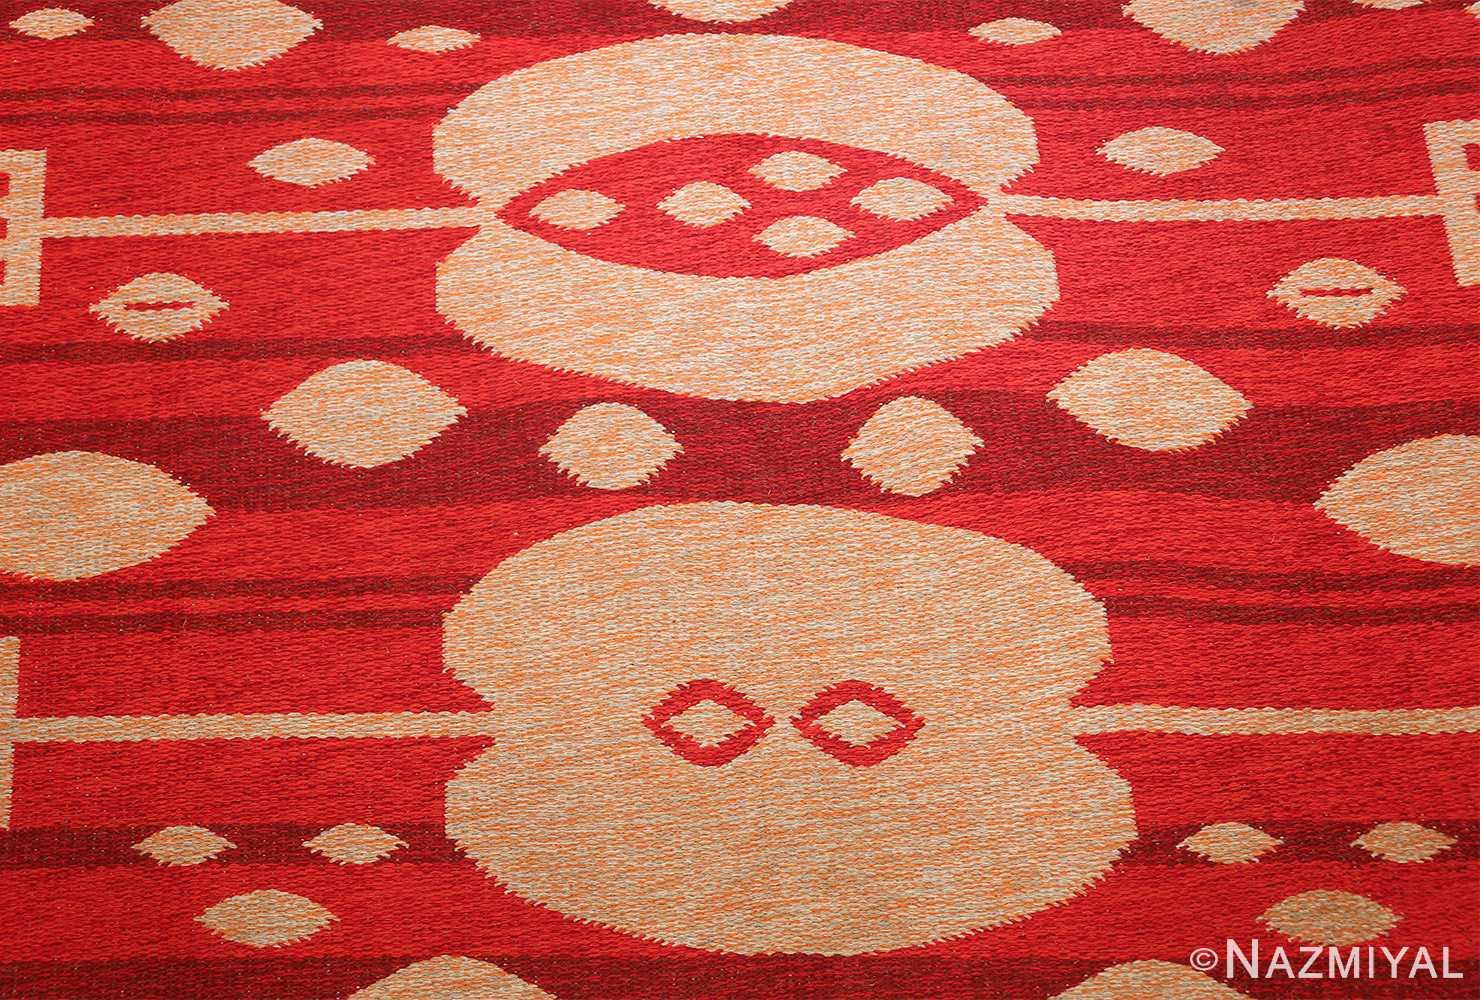 vintage double sided swedish kilim 48285 field red Nazmiyal